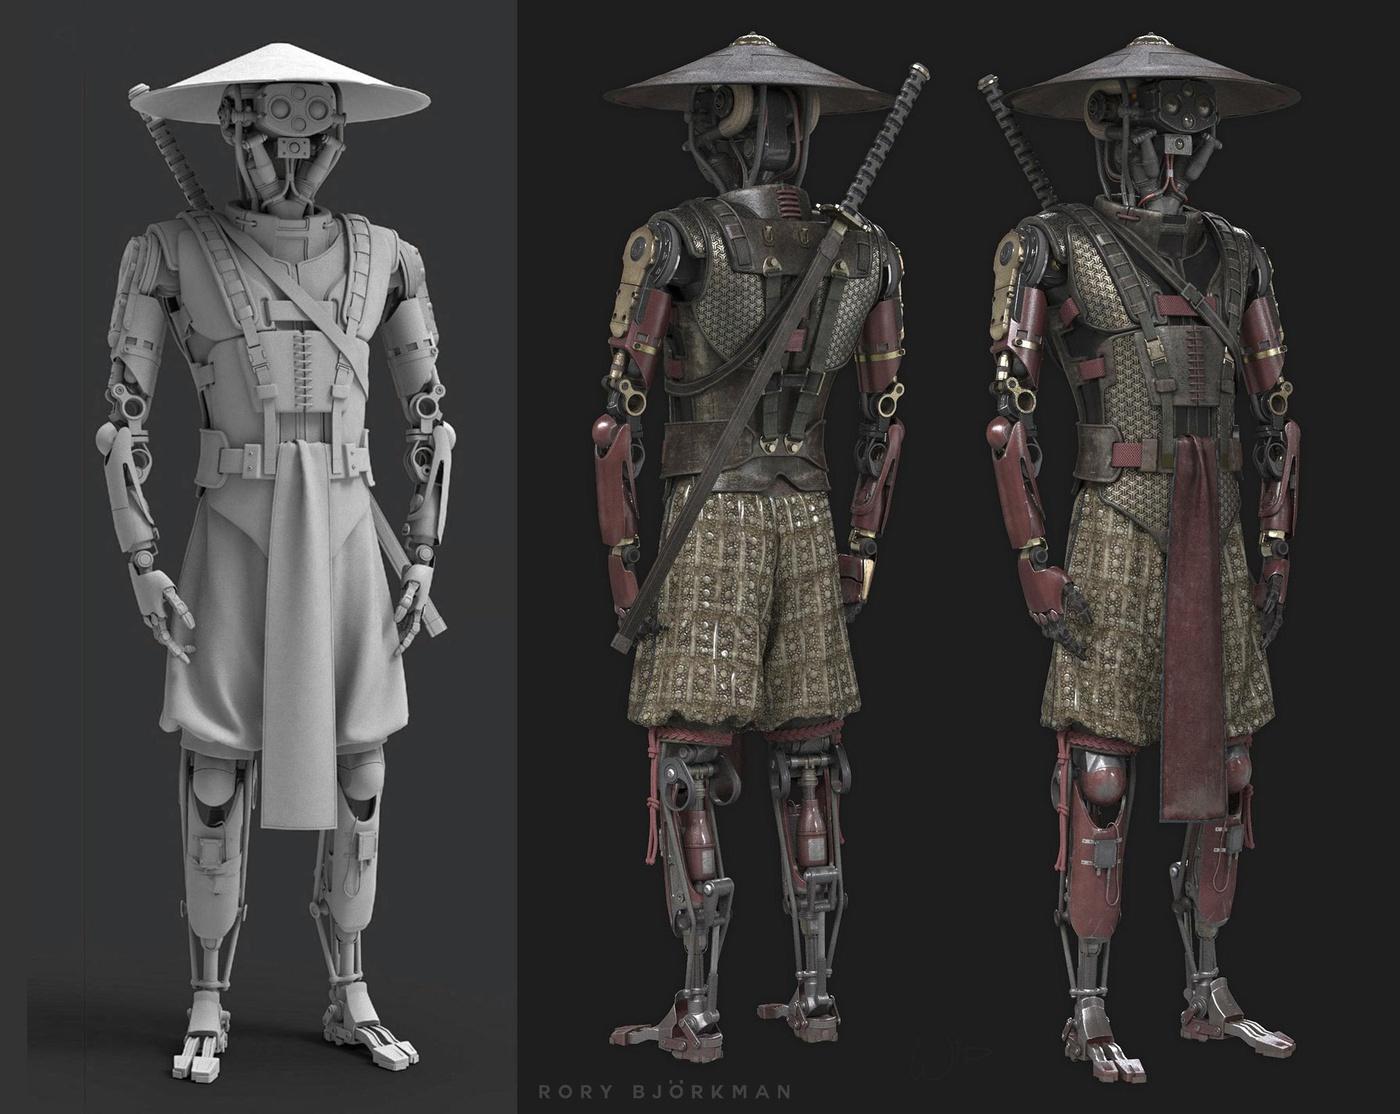 robotic 3d model design samurai mecha